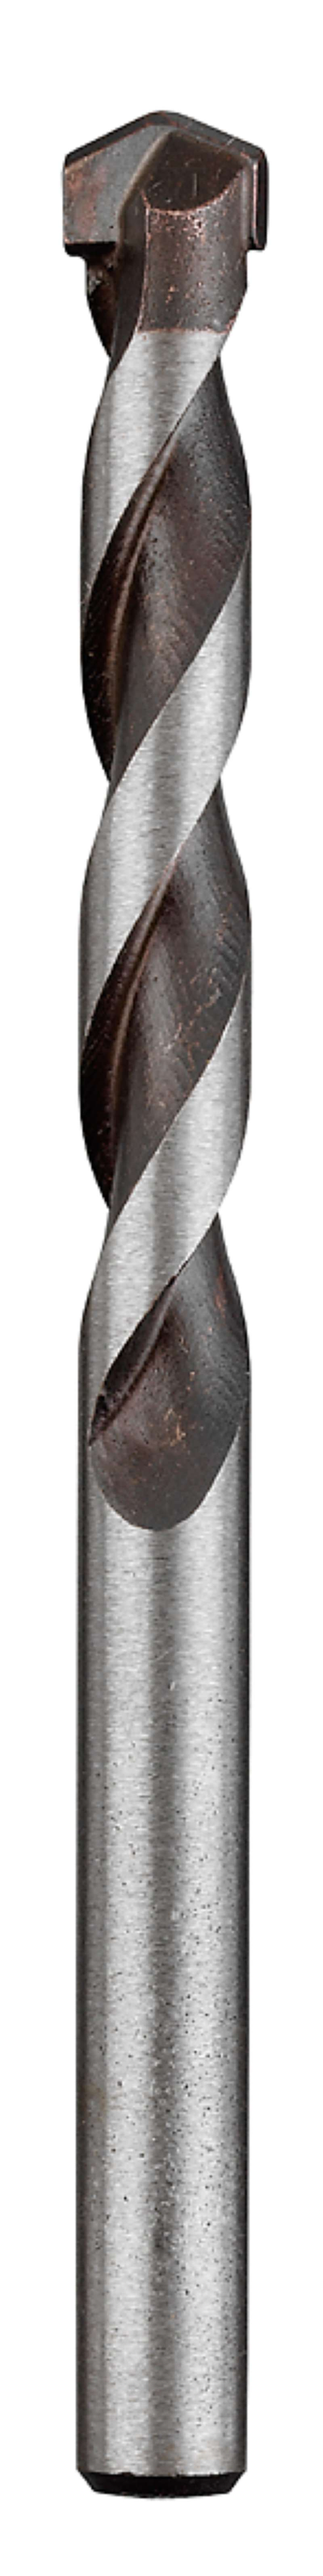 Сверло по камню Kwb 044-640 сверло по камню kwb 044 700